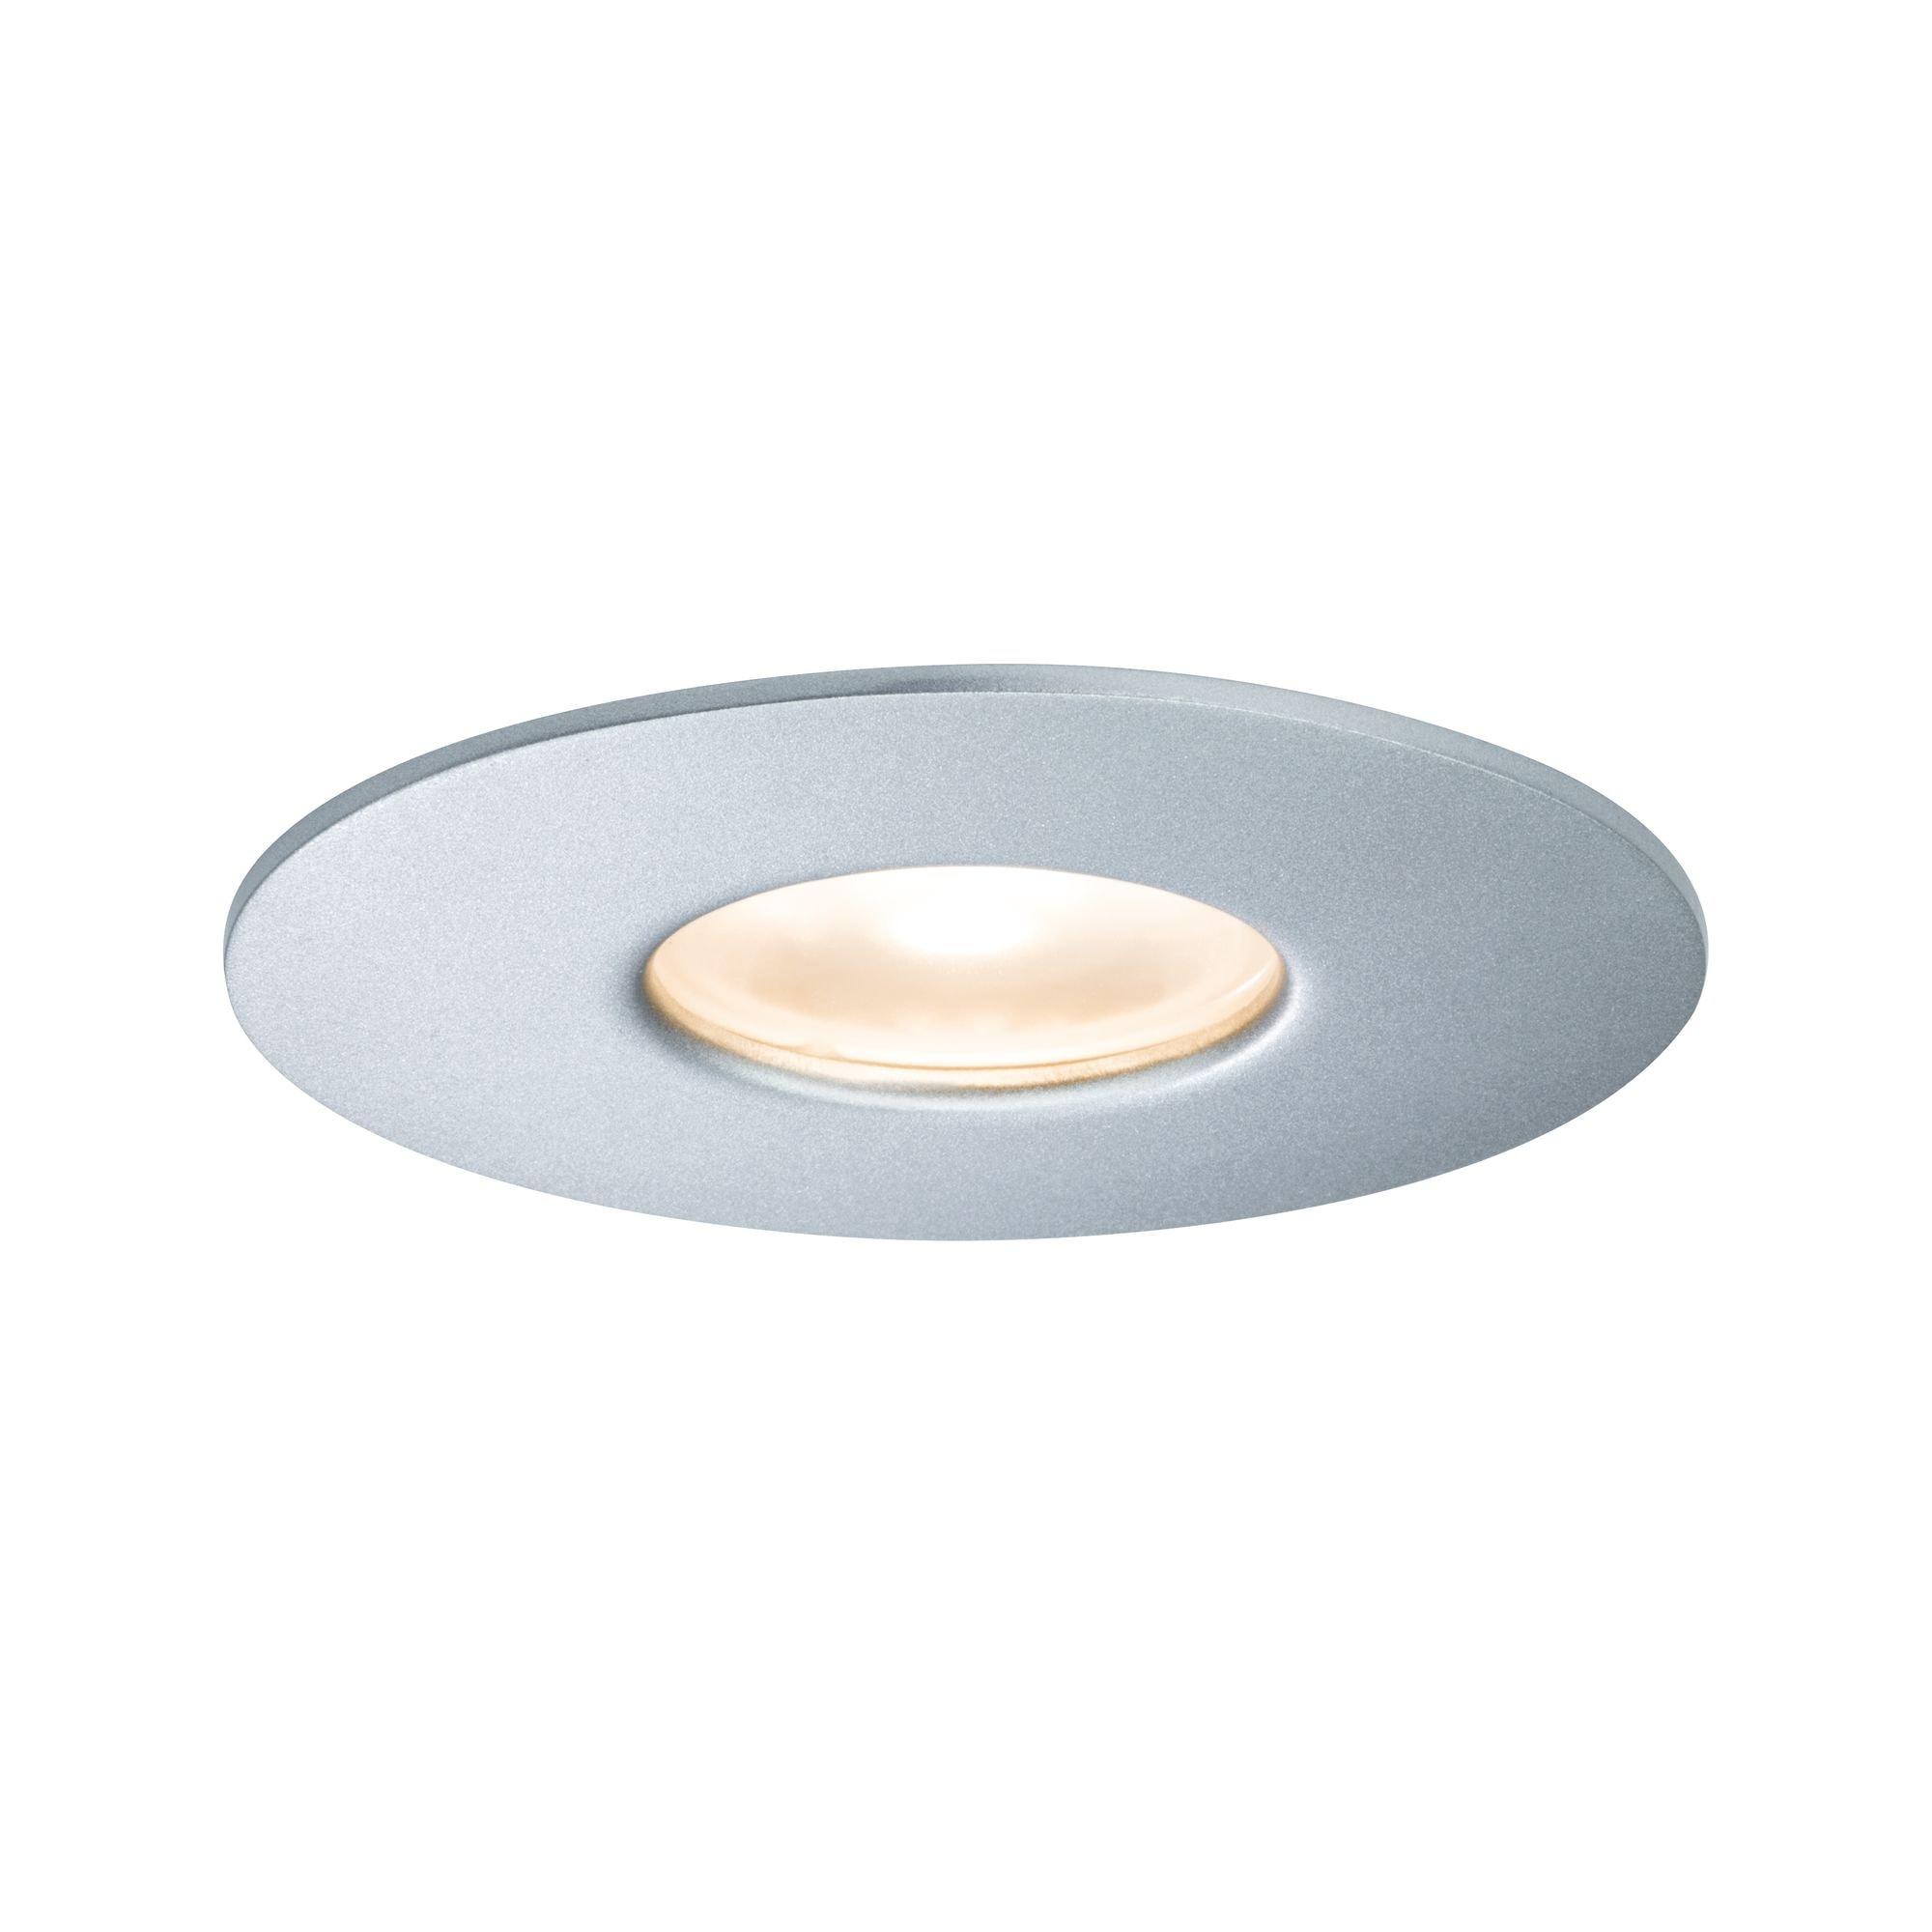 Paulmann,LED Einbaustrahler House 34° 5,8W Silber